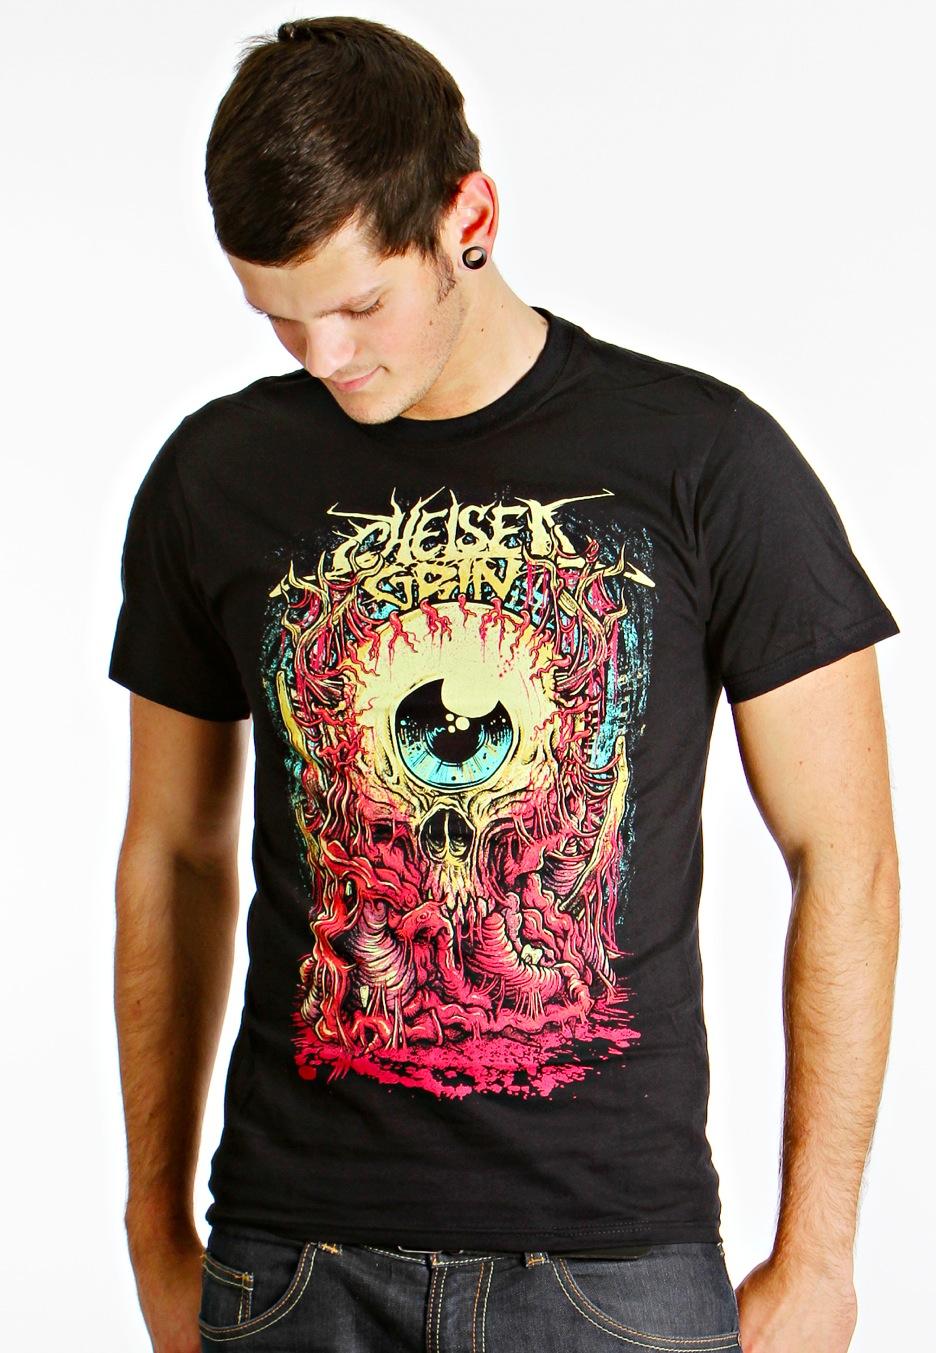 chelsea grin eye t shirt official deathcore merchandise shop uk. Black Bedroom Furniture Sets. Home Design Ideas